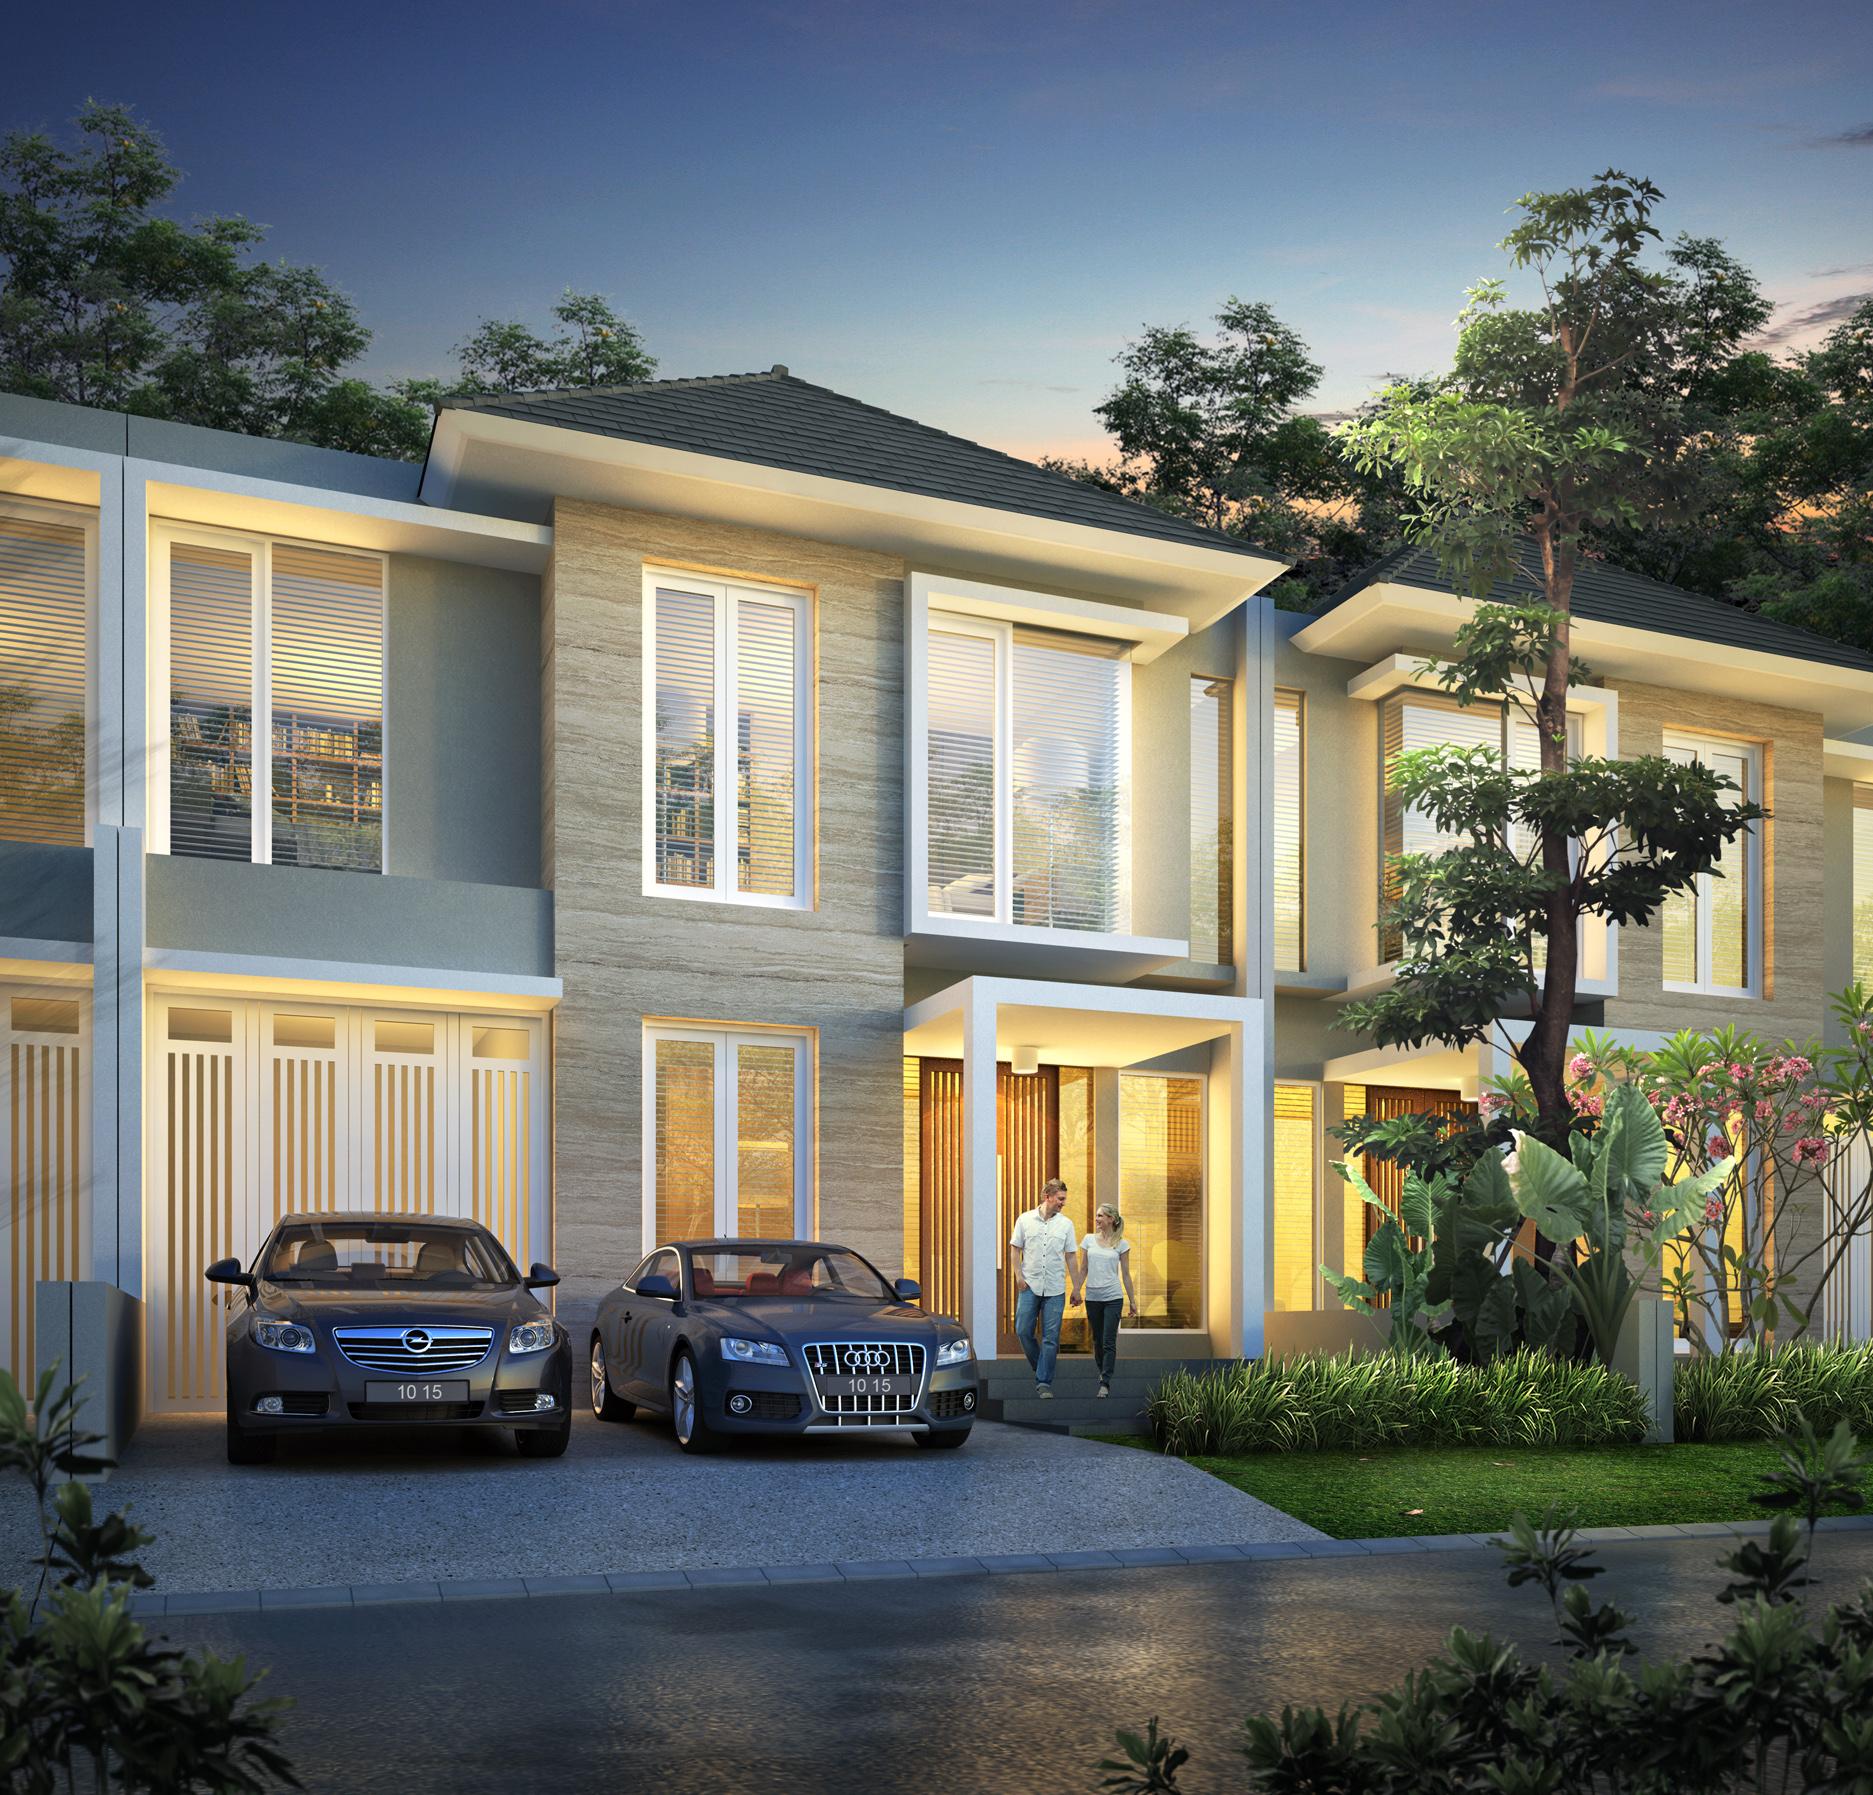 Berry Jpg Desain Rumah Surabaya Barat Citraland Tipe Type Citra